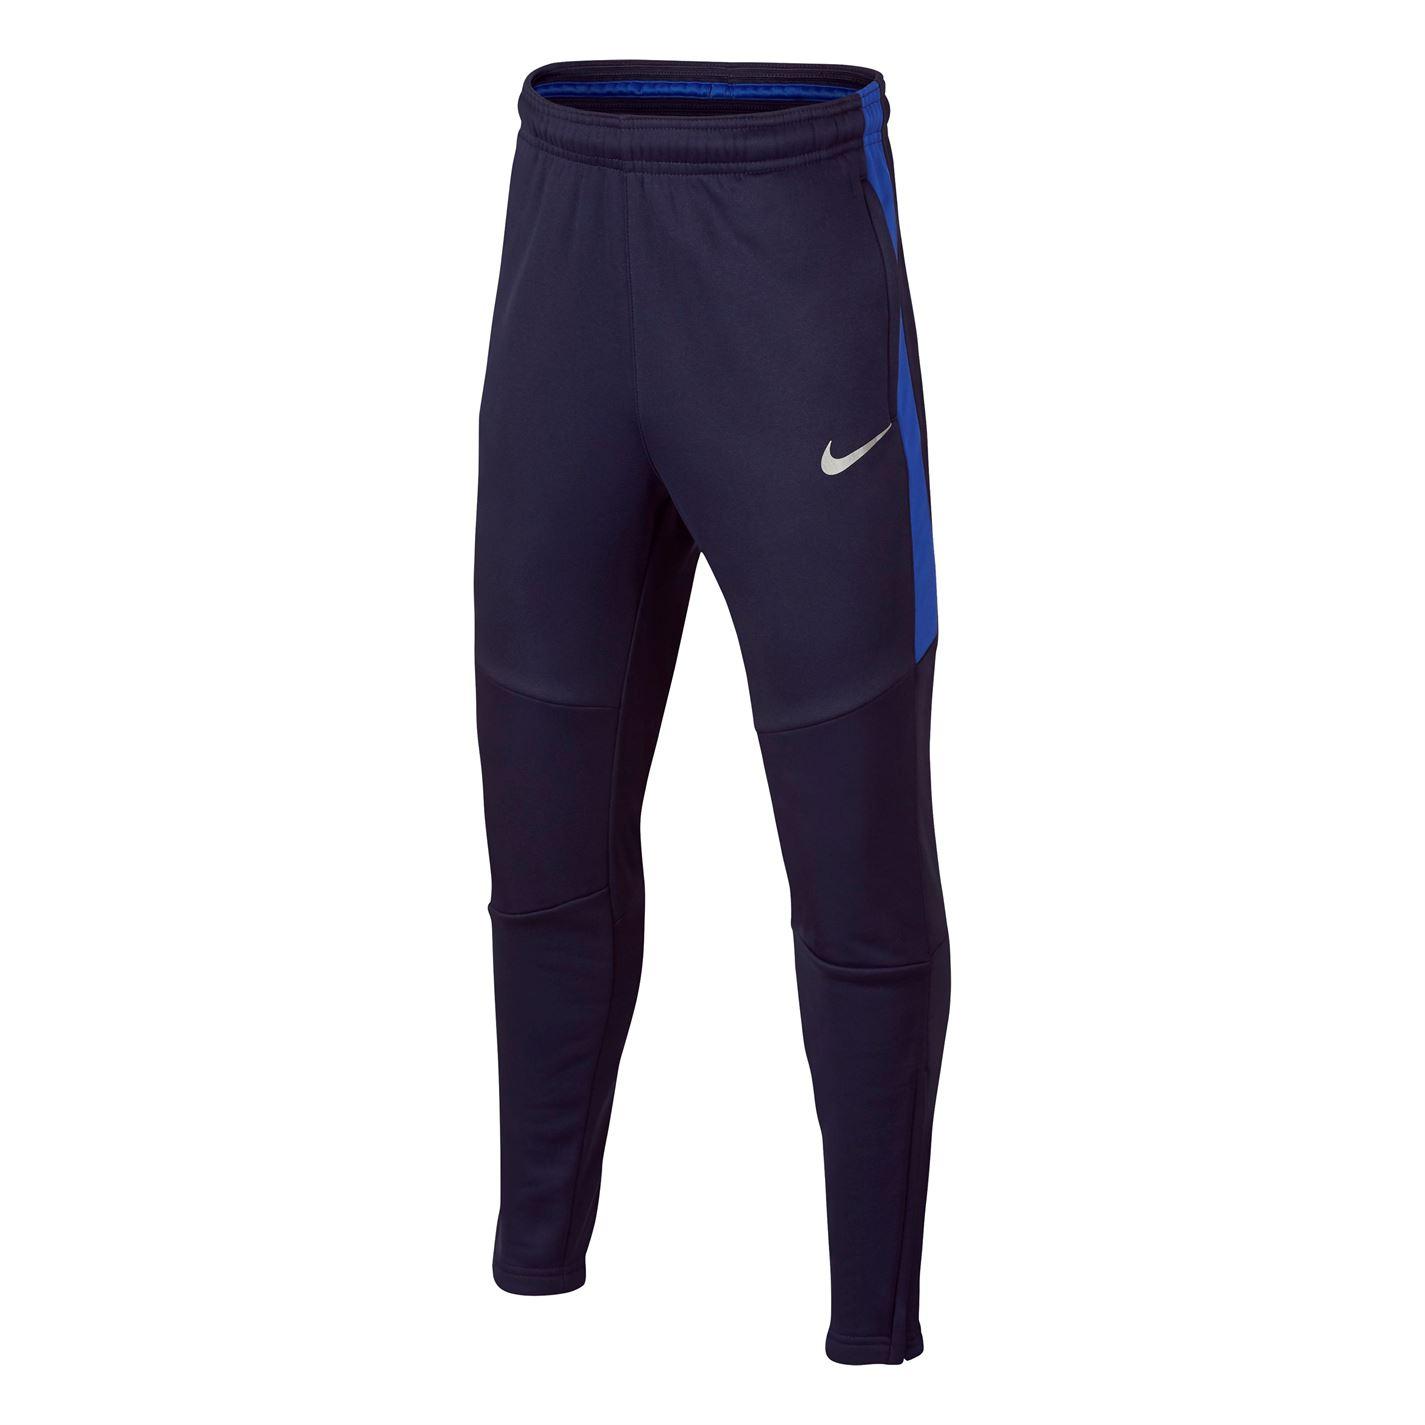 Tepláky Nike Therma Squad Jogging Pants Junior Boys - Glami.cz 2bc66fa1cb